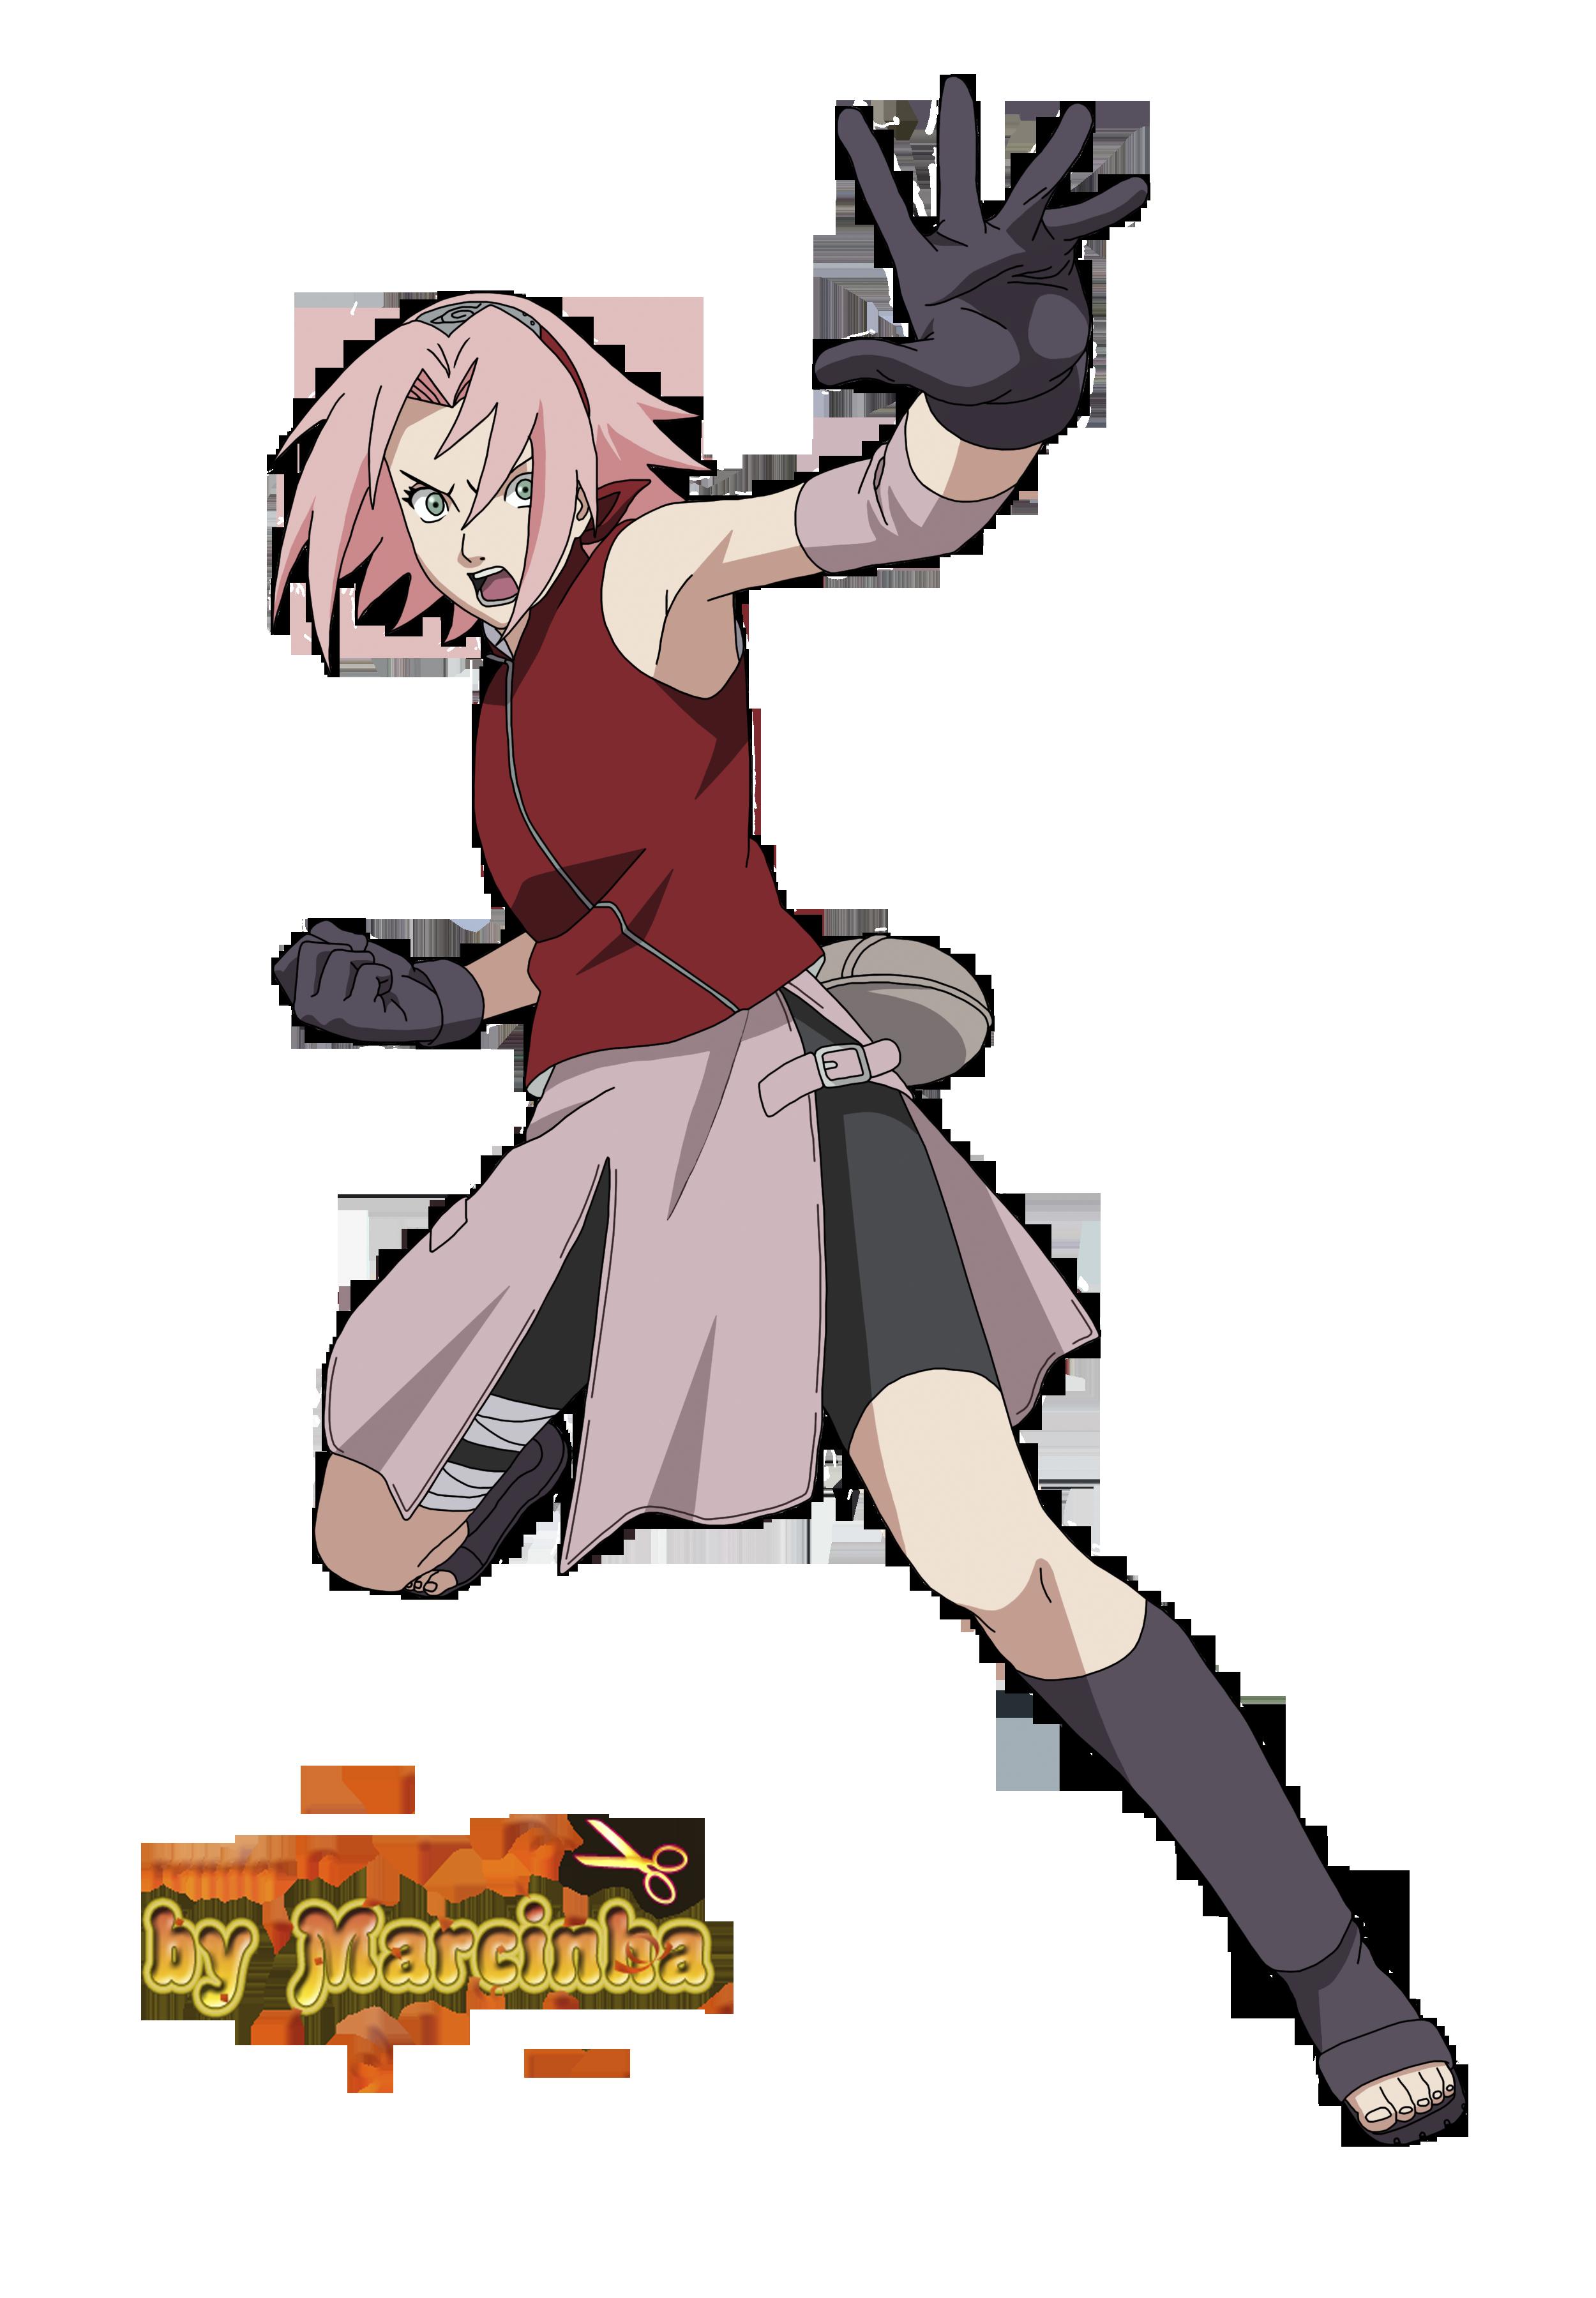 Png Haruno Sakura By Marcinha20 Personagens De Anime Desenhos